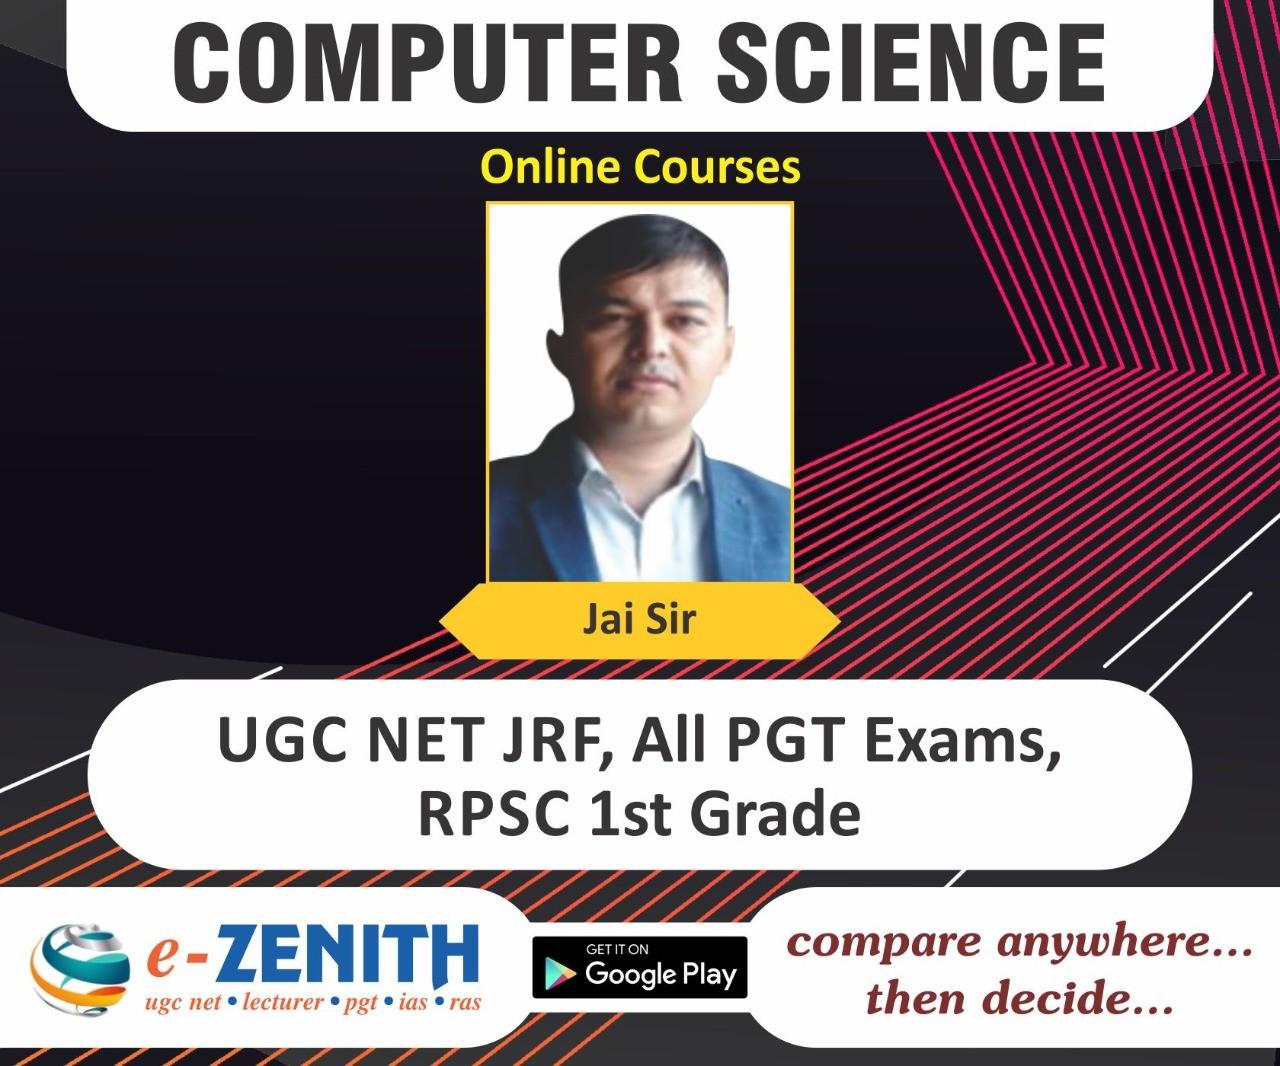 UGC NET, RPSC 1st GRADE COMPUTER SCIENCE ONLINE COURSE